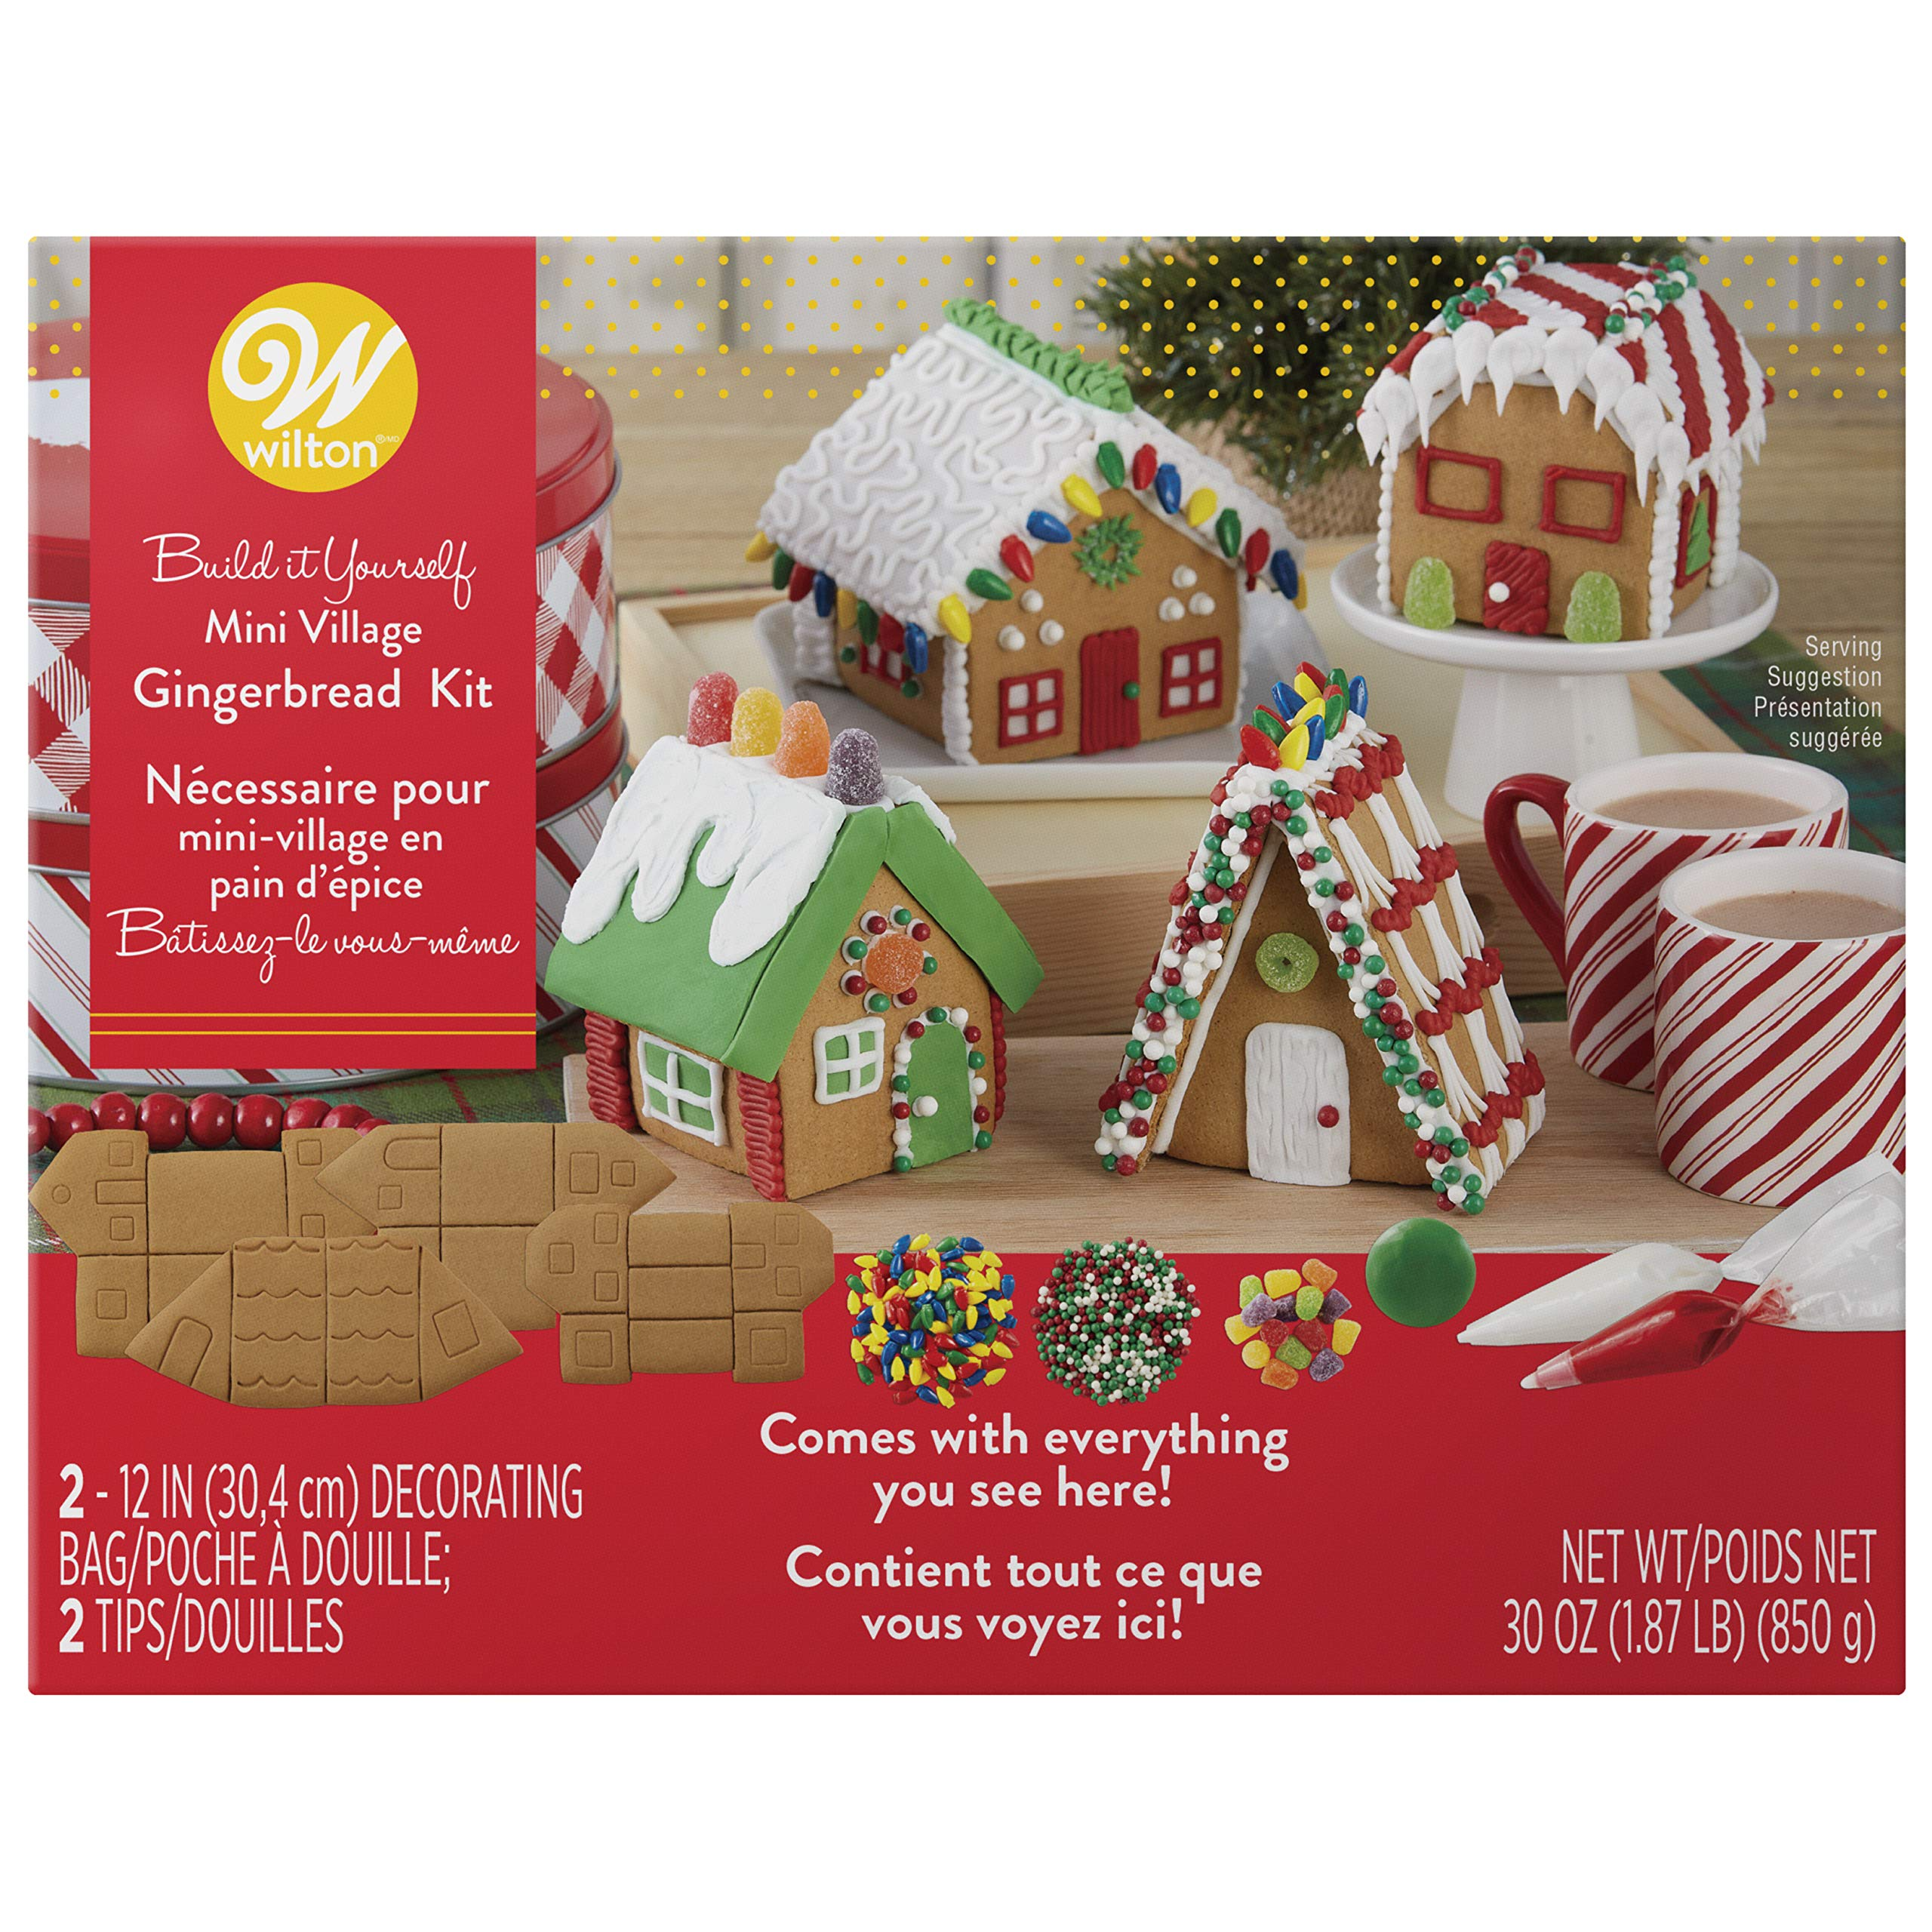 Wilton Build it Yourself Mini Village Gingerbread Decorating Kit